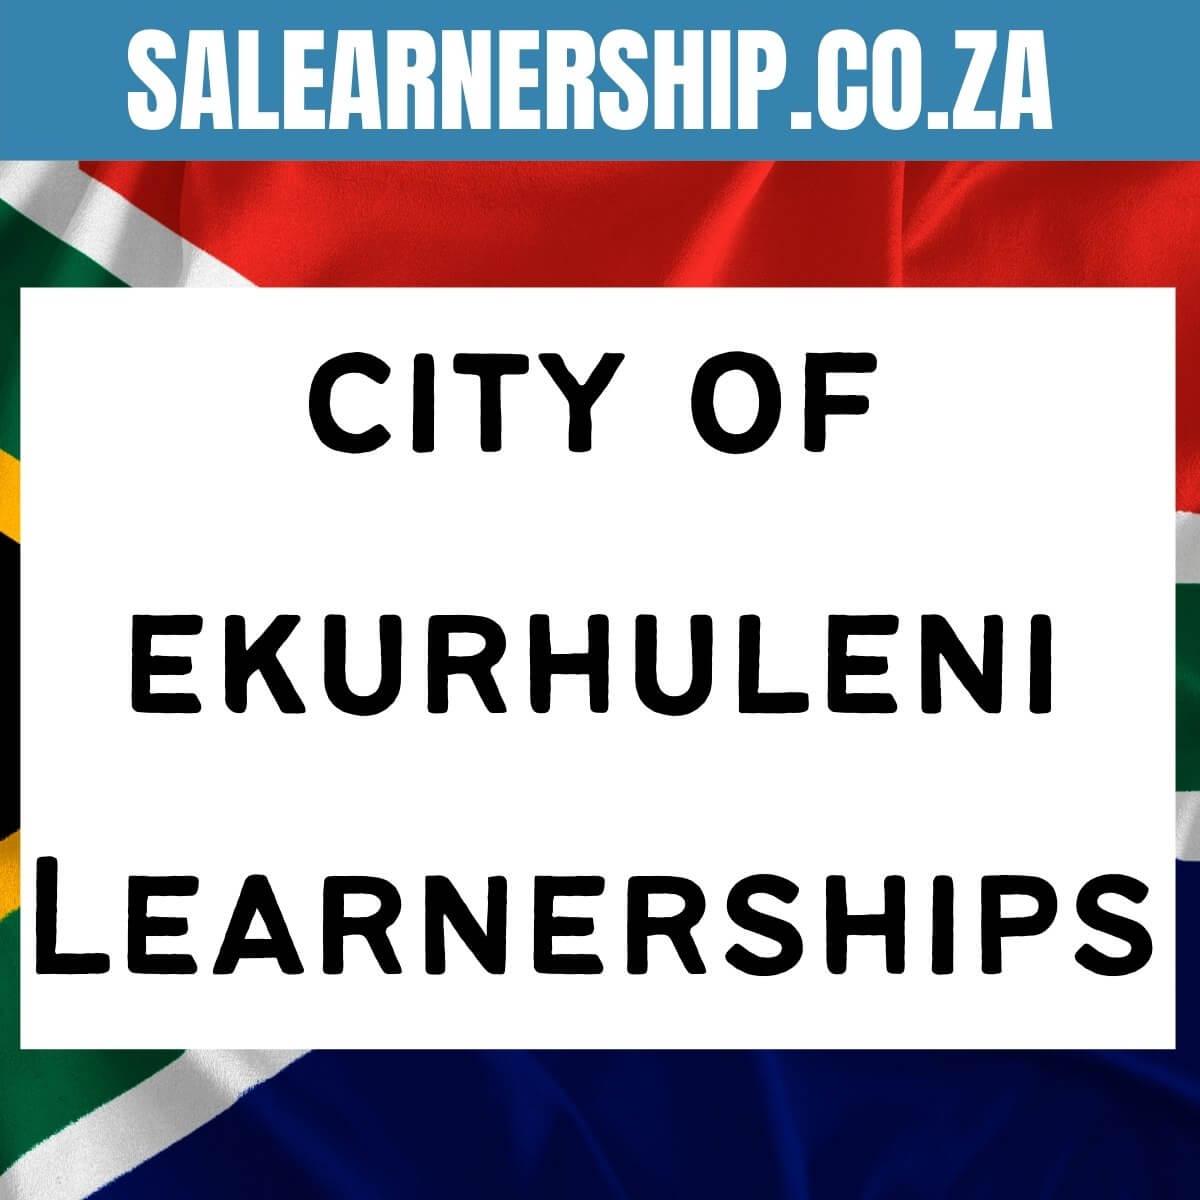 city ekurhuleni learnerships